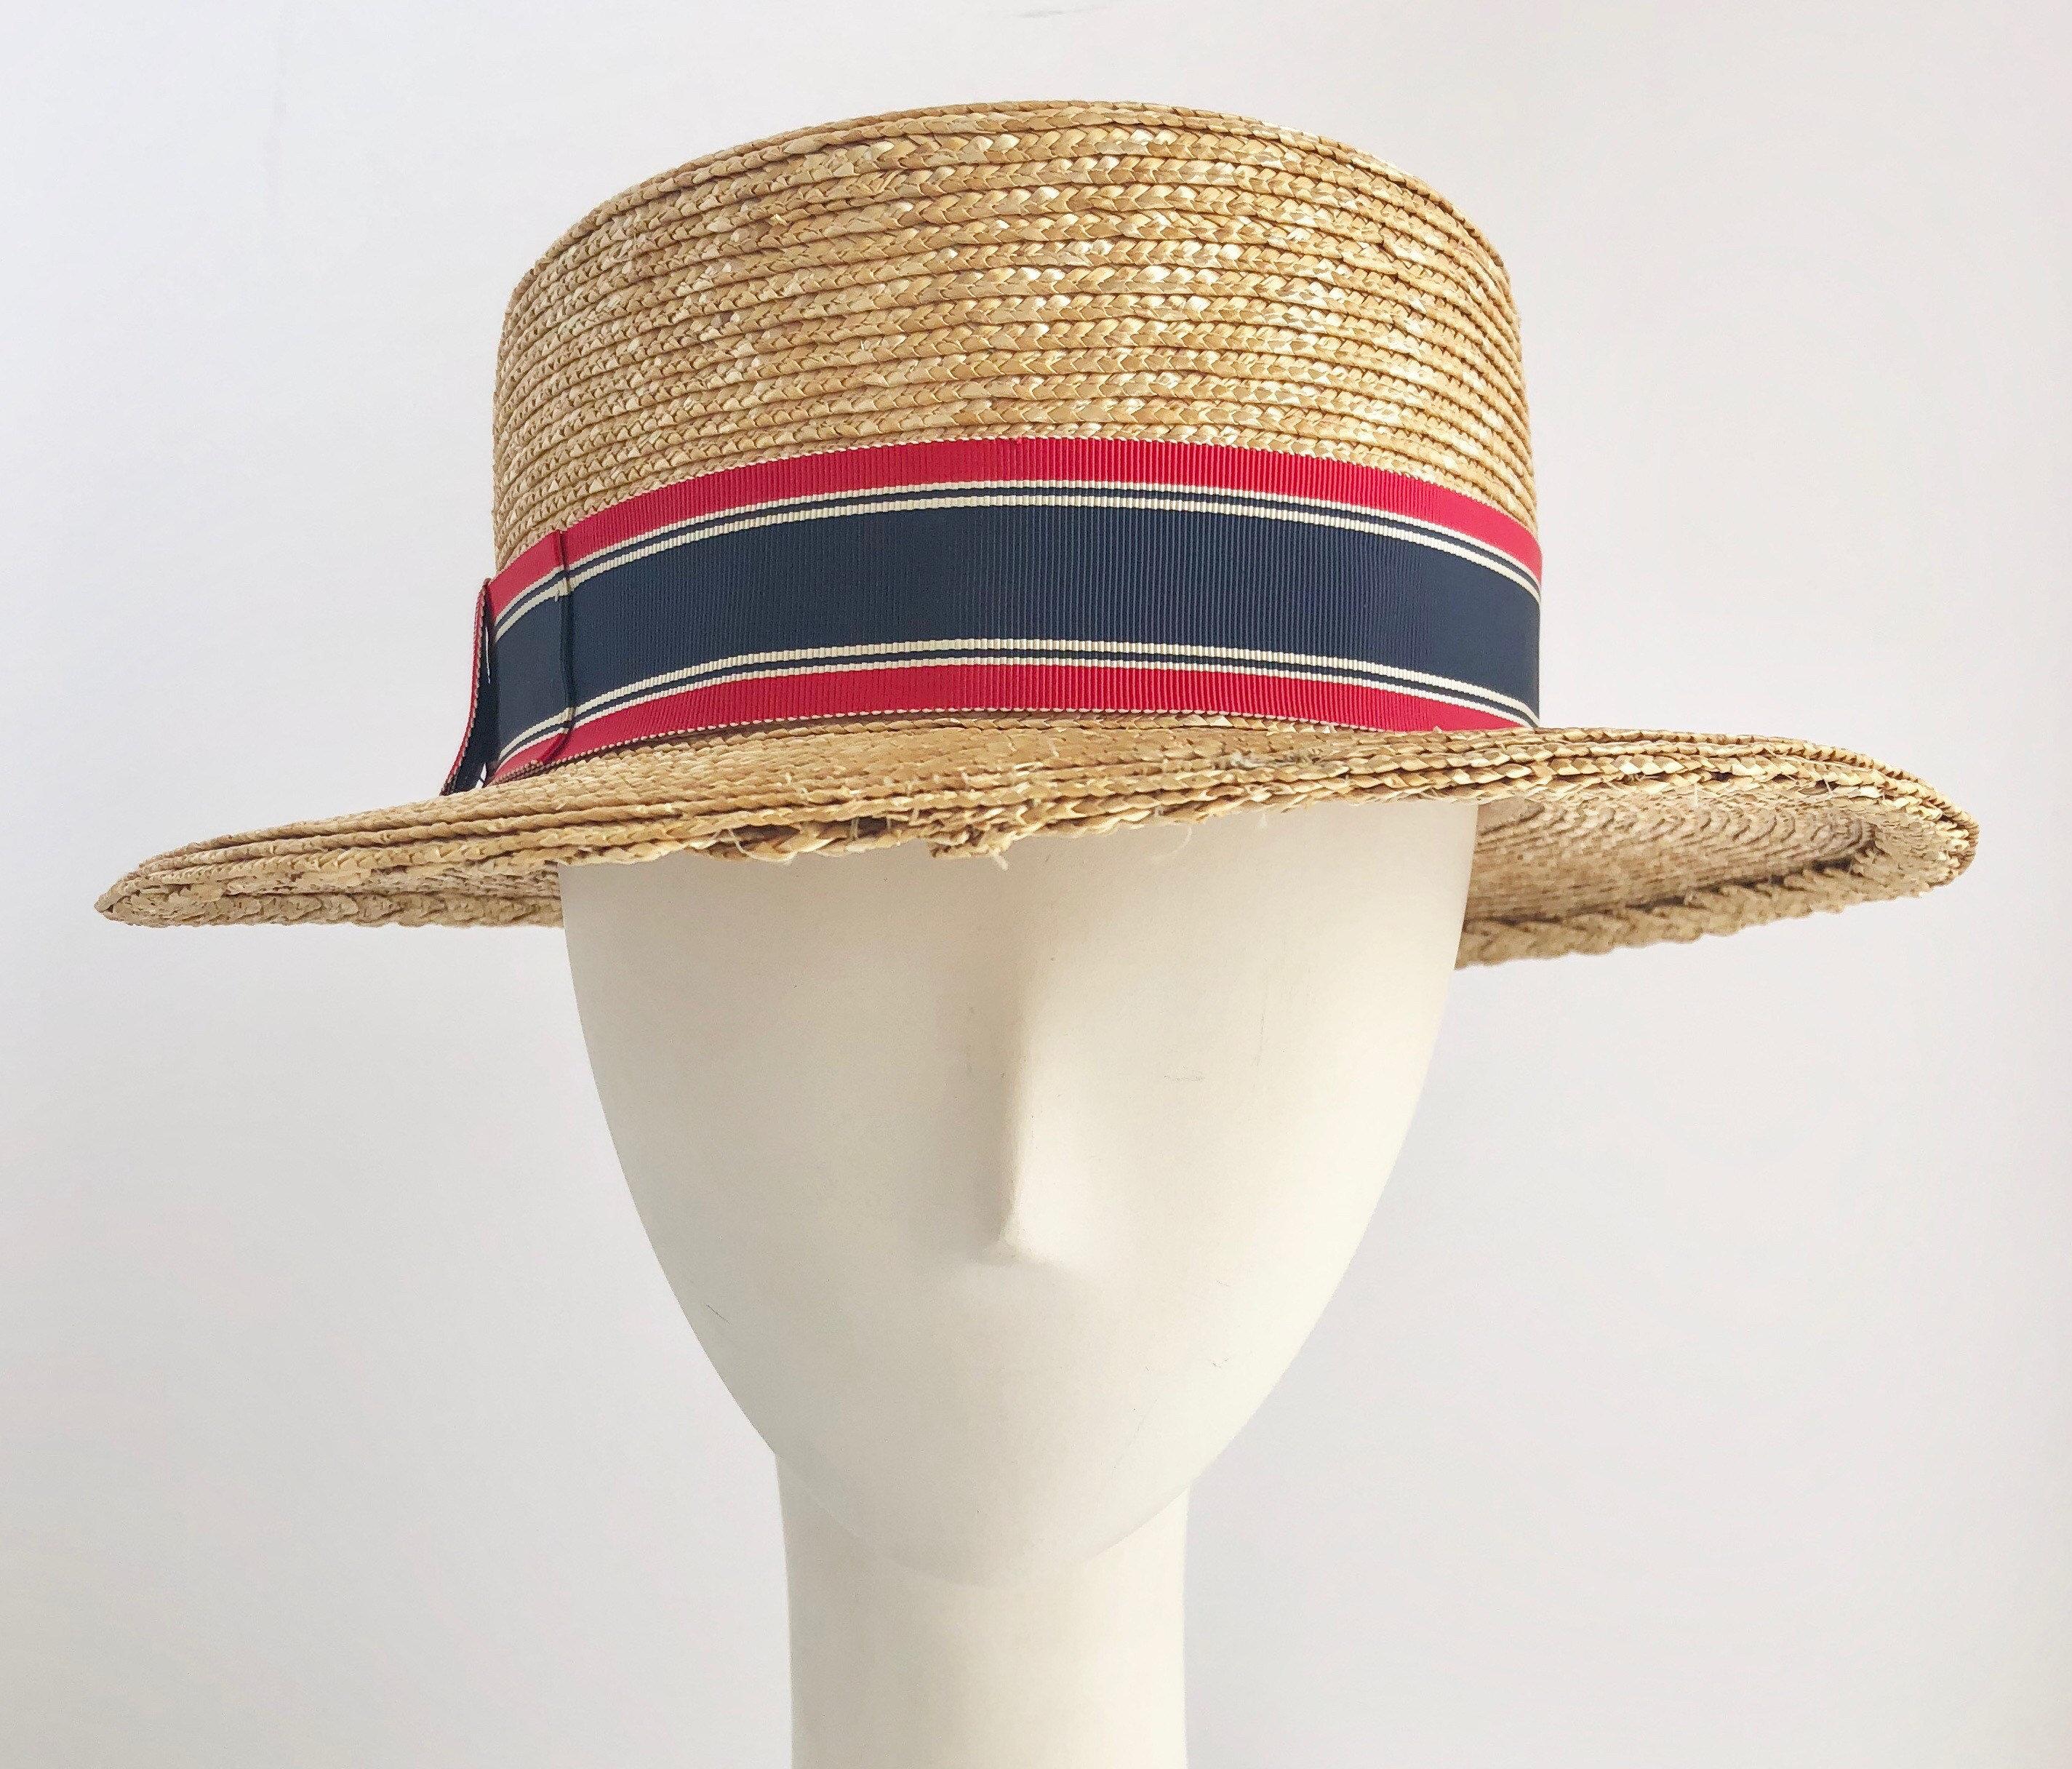 b3ad643942fa0c Classic Patriotic Straw Boater Hat   Etsy